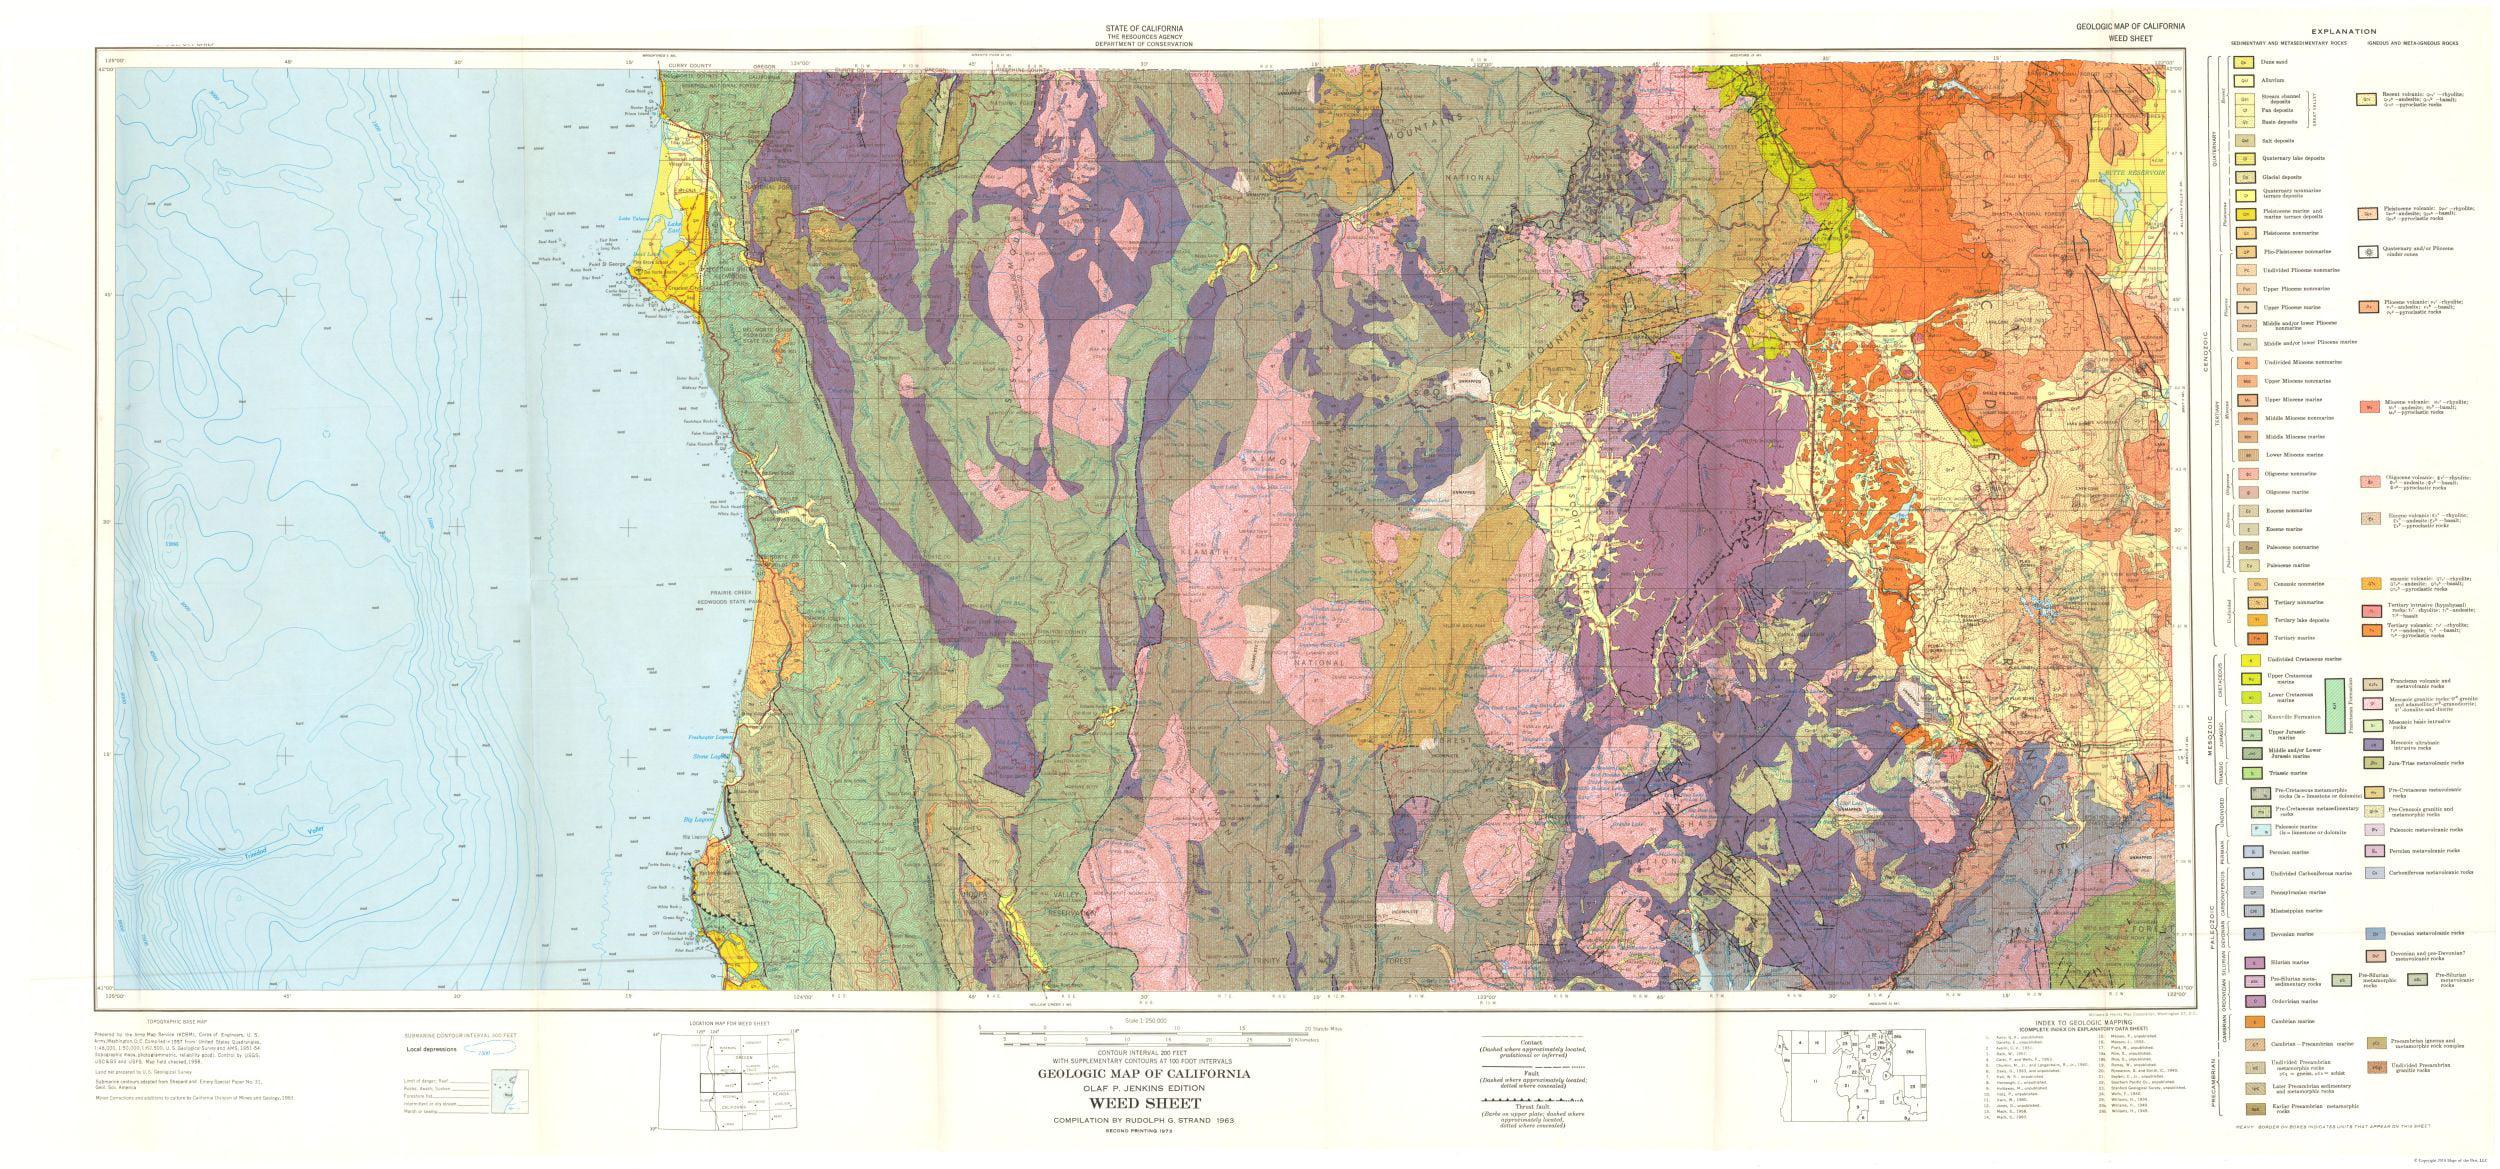 Mining Map - Weed California Sheet - CA Mines 1957 - 49 18 x 23